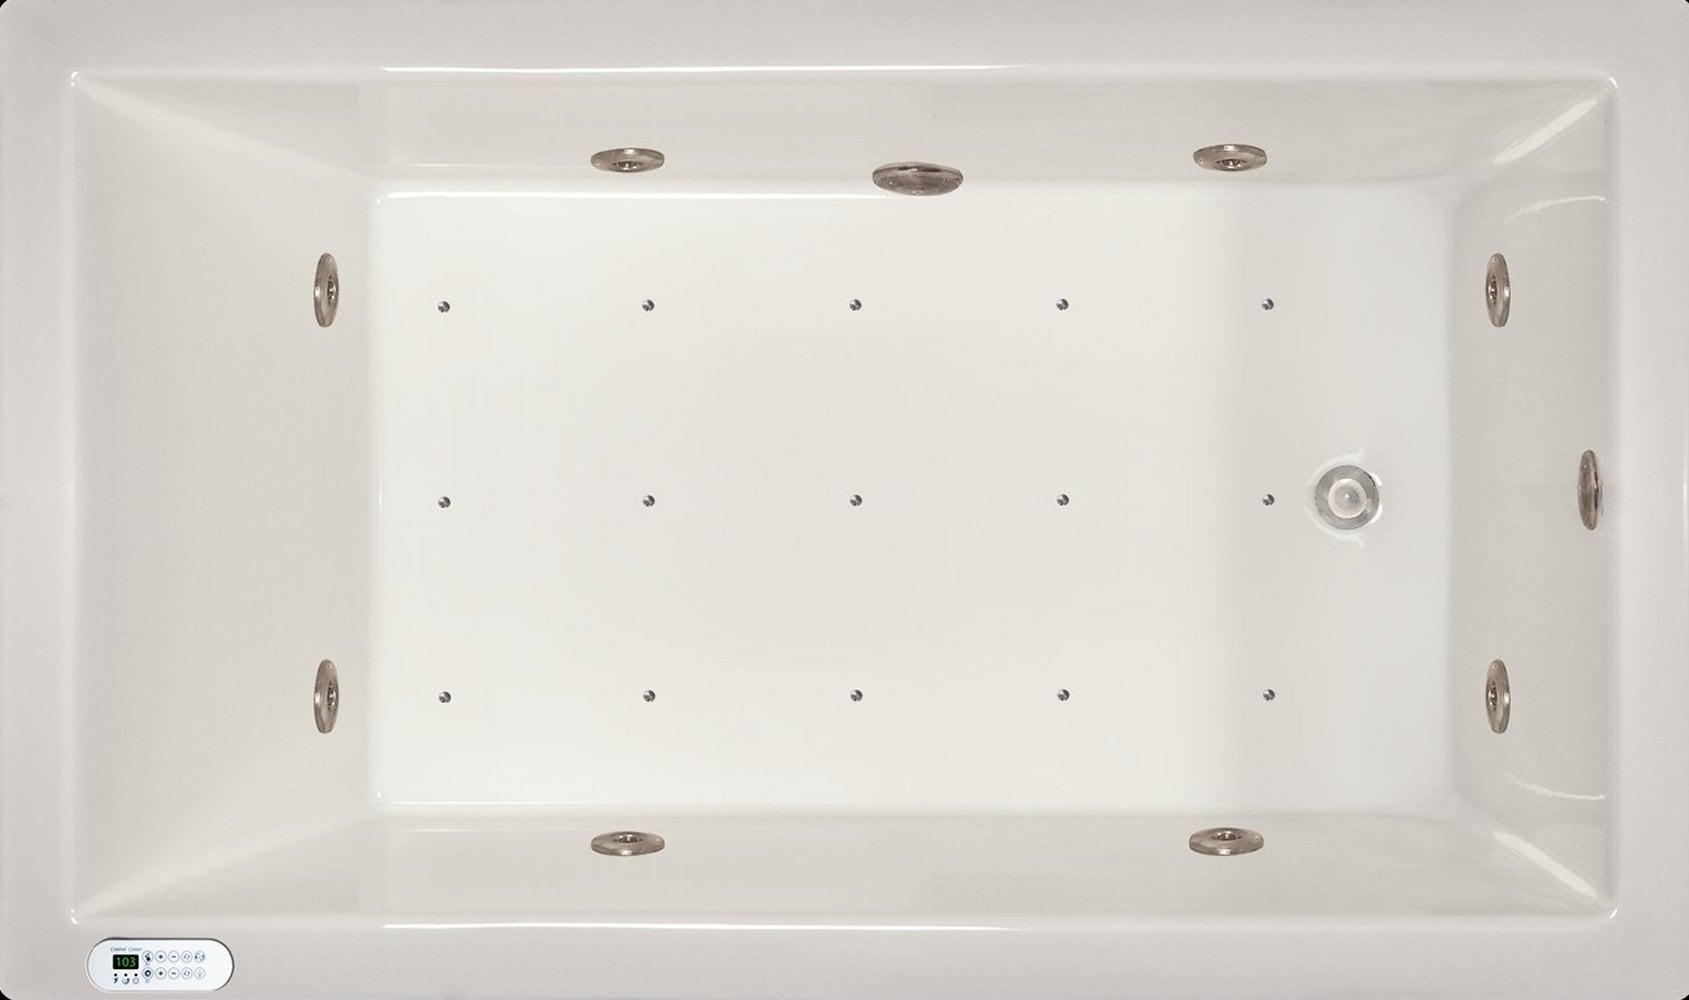 Drop-in Bathtub / 72x42x18 / high gloss white acrylic / Rectangle / LPI228-C-LD Pinnacle Bath - Air/Whirlpool Combo 0